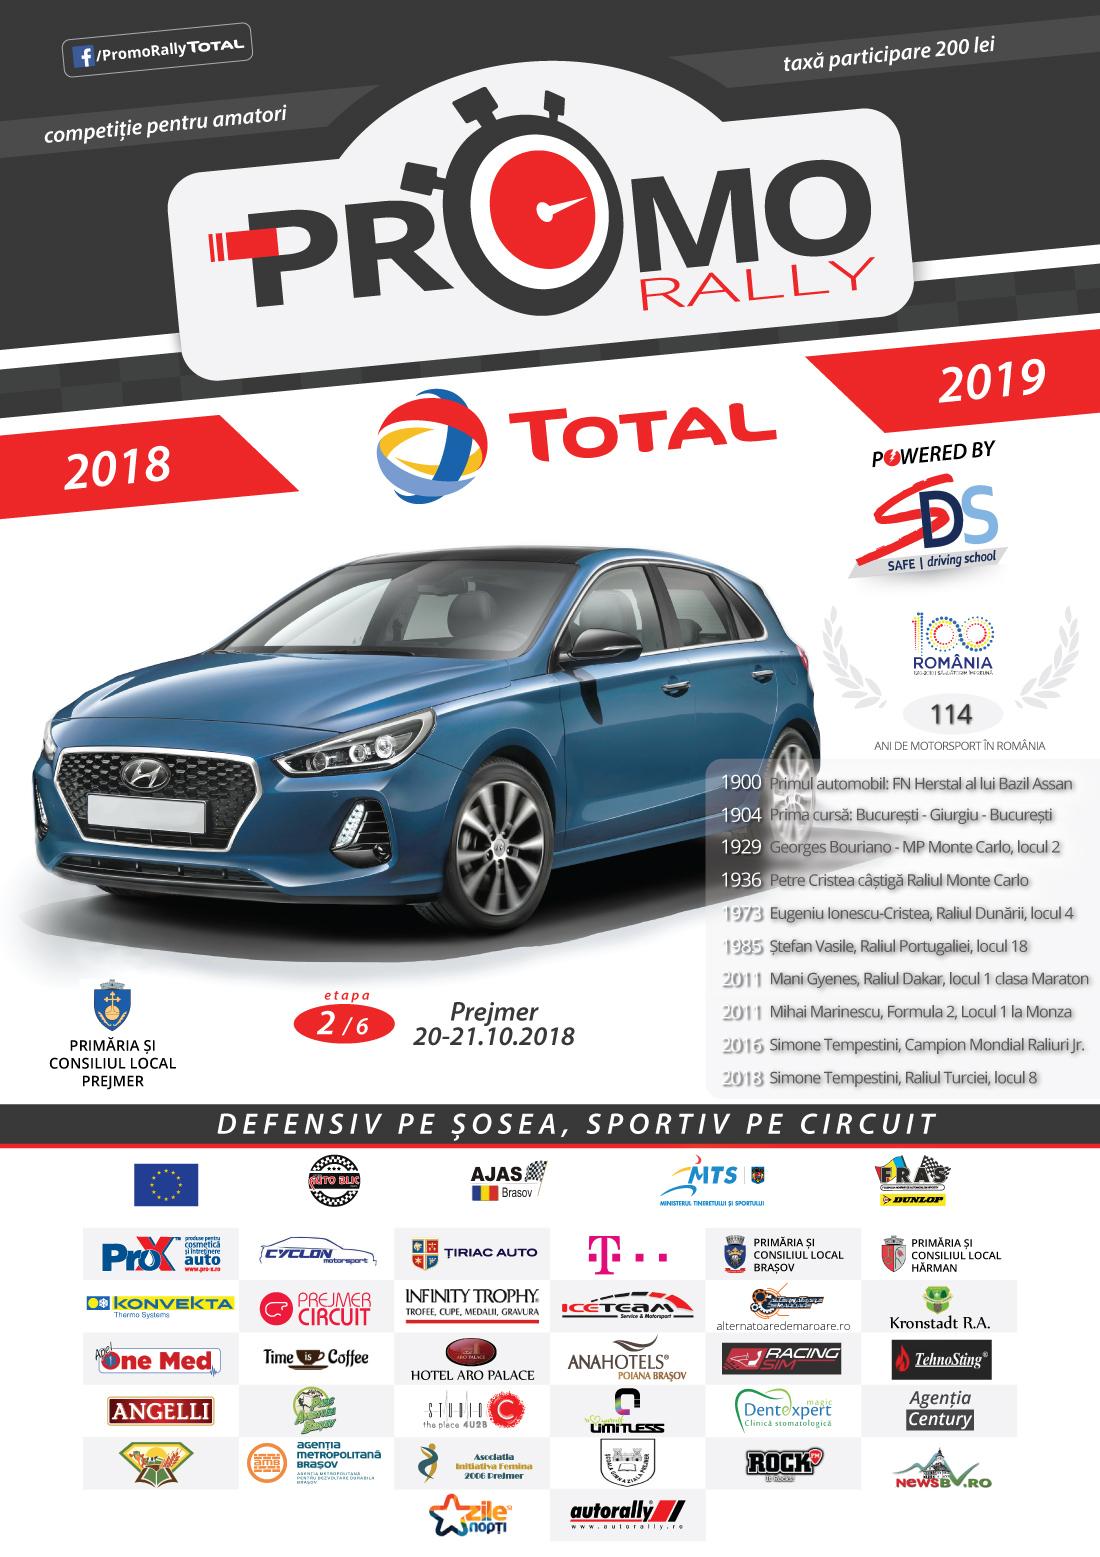 Promo Rally Total 2018